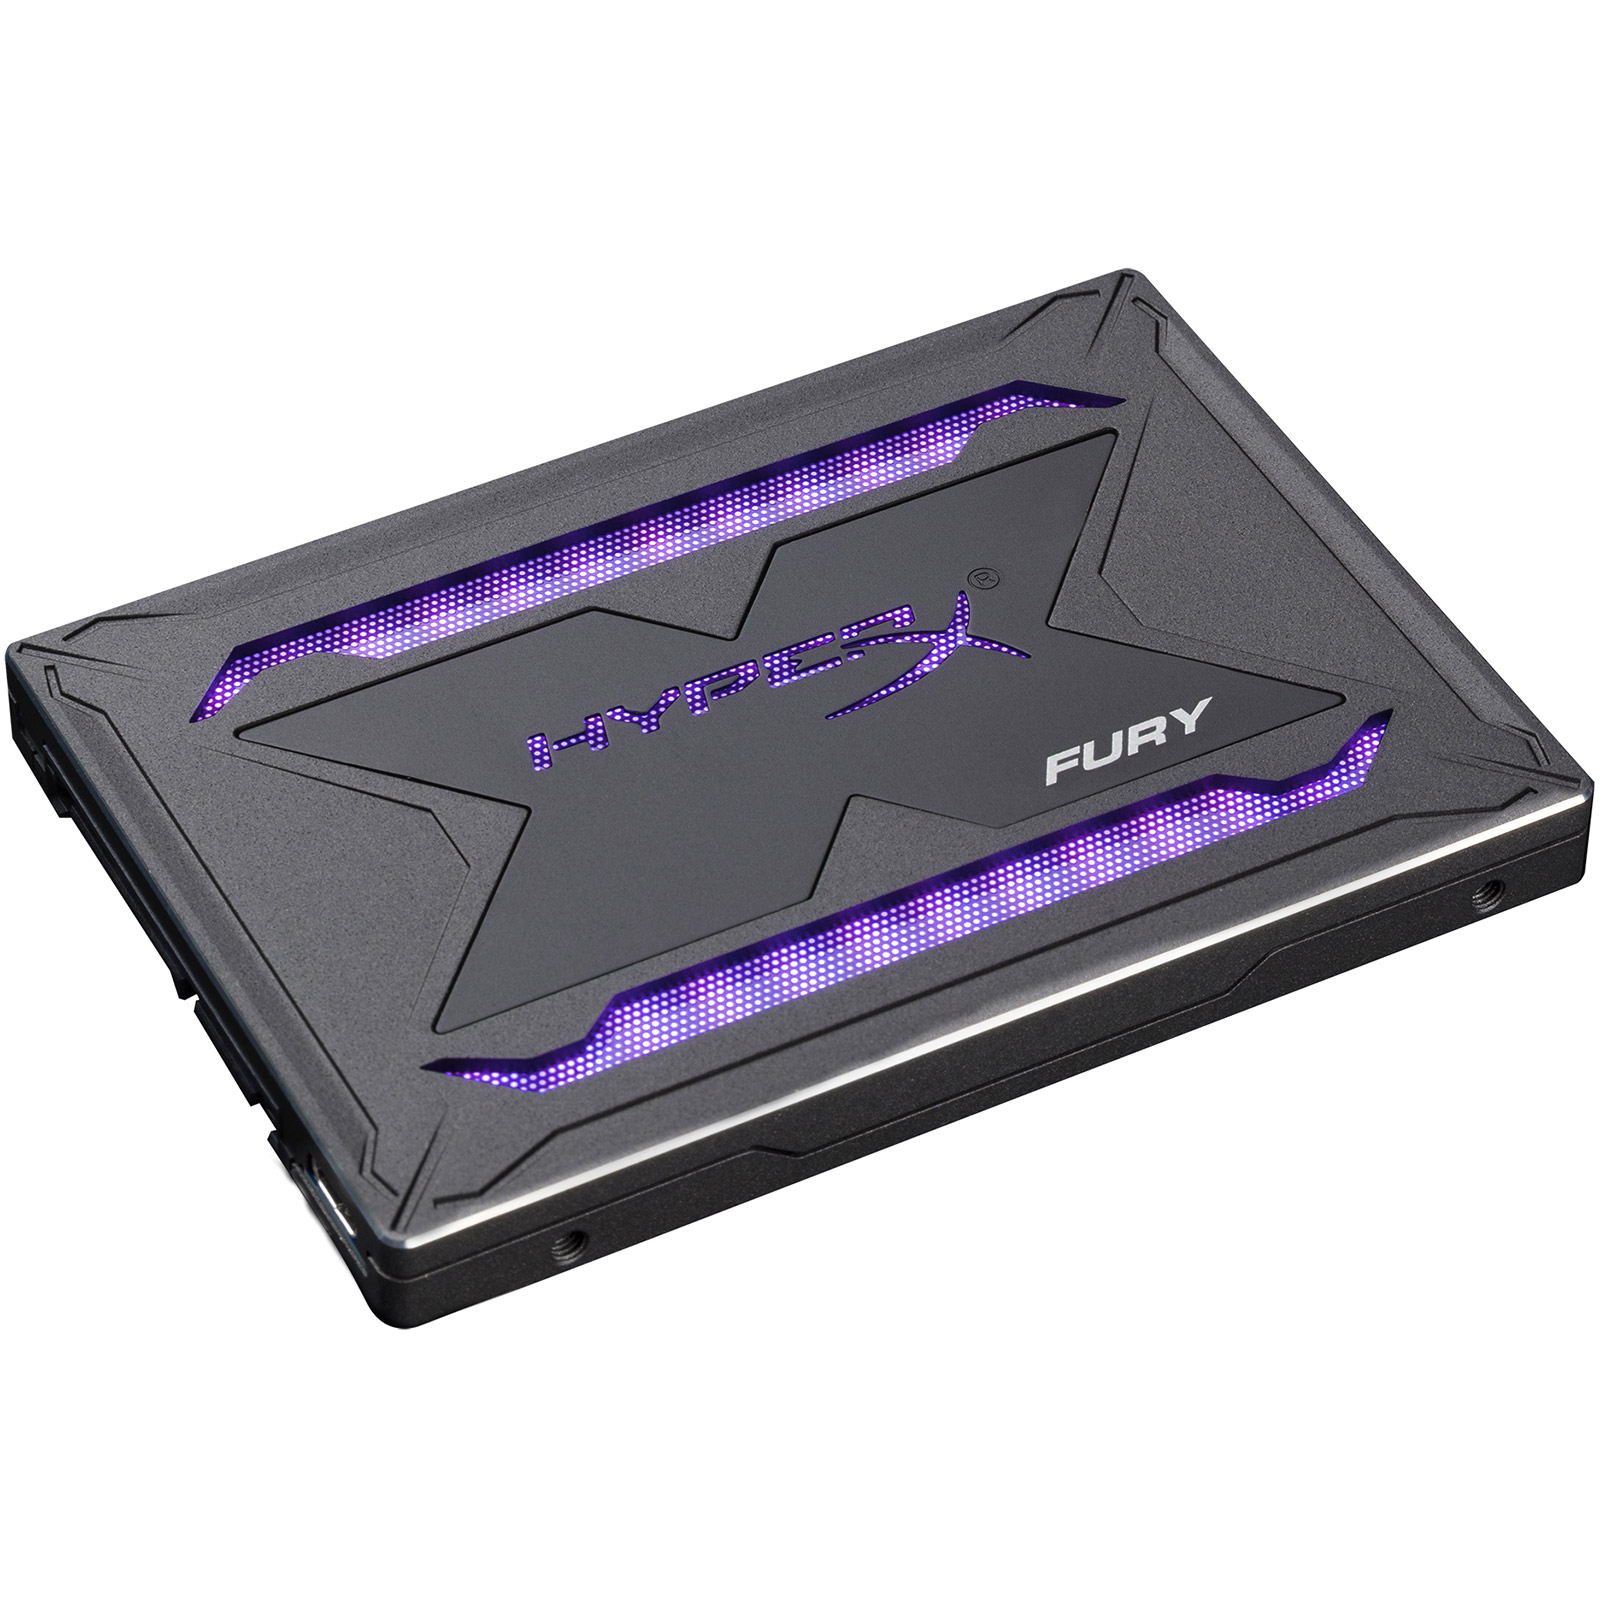 "Disque SSD HyperX Fury RGB SSD 240 Go SSD 240 Go 9.5 mm 2.5"" Serial ATA 6Gbit/s avec rétroéclairage RGB"